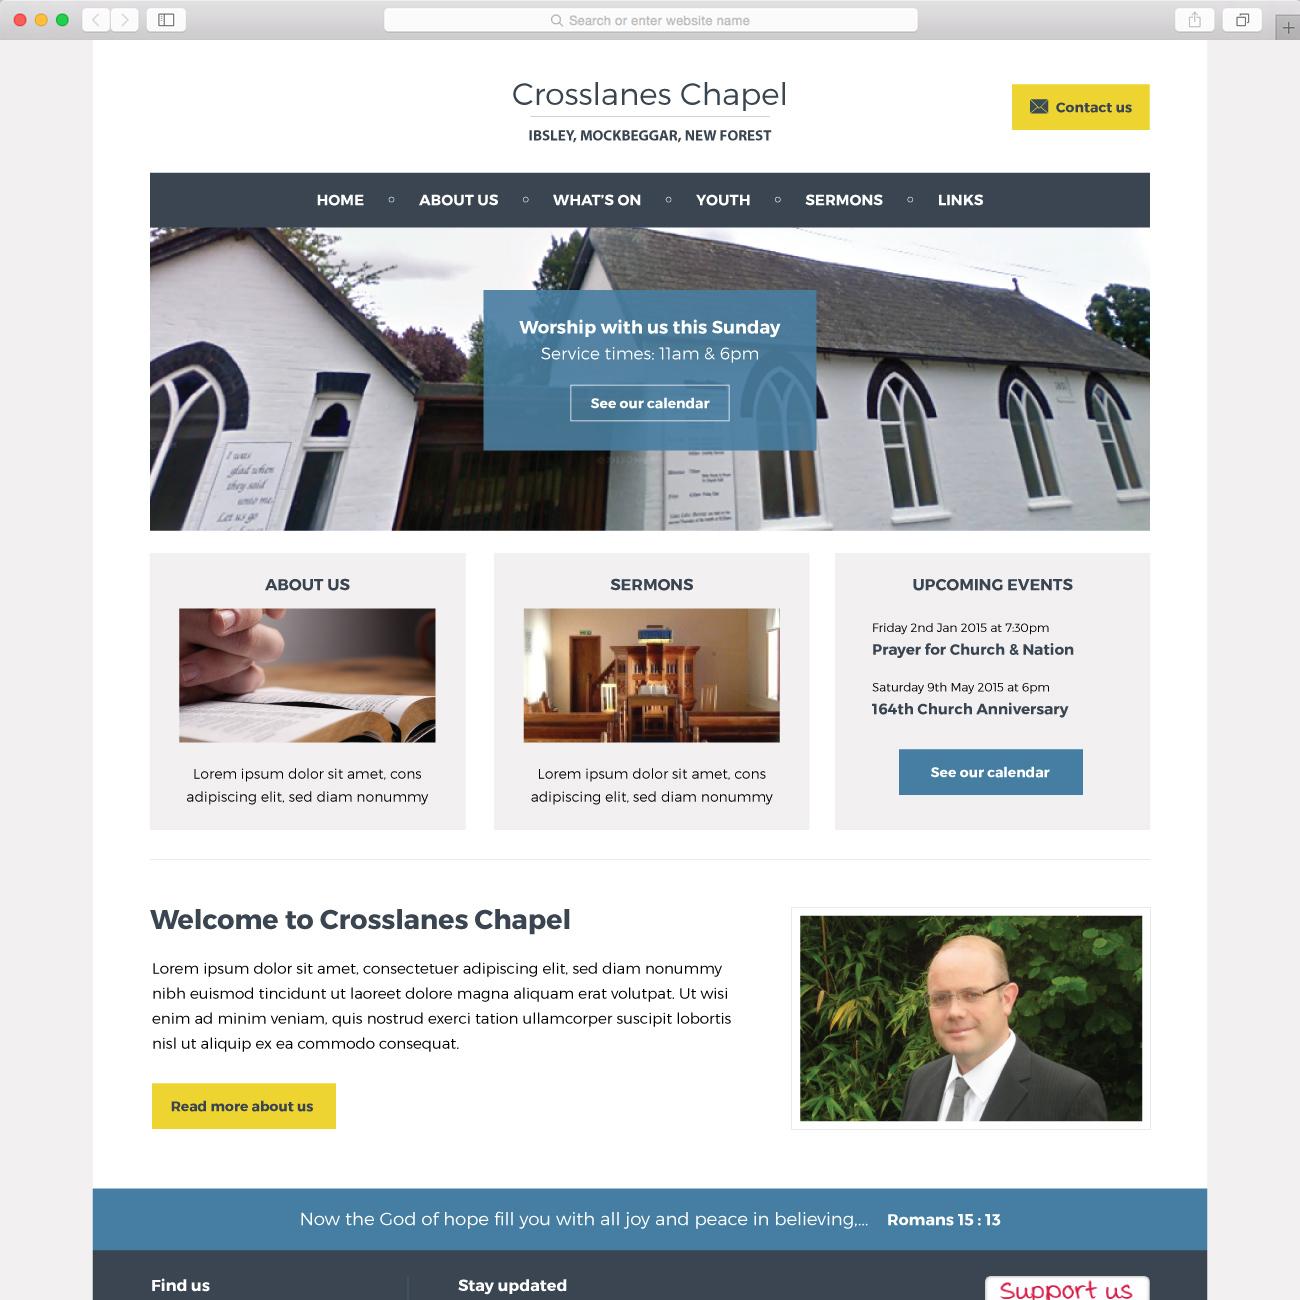 Crosslanes Chapel